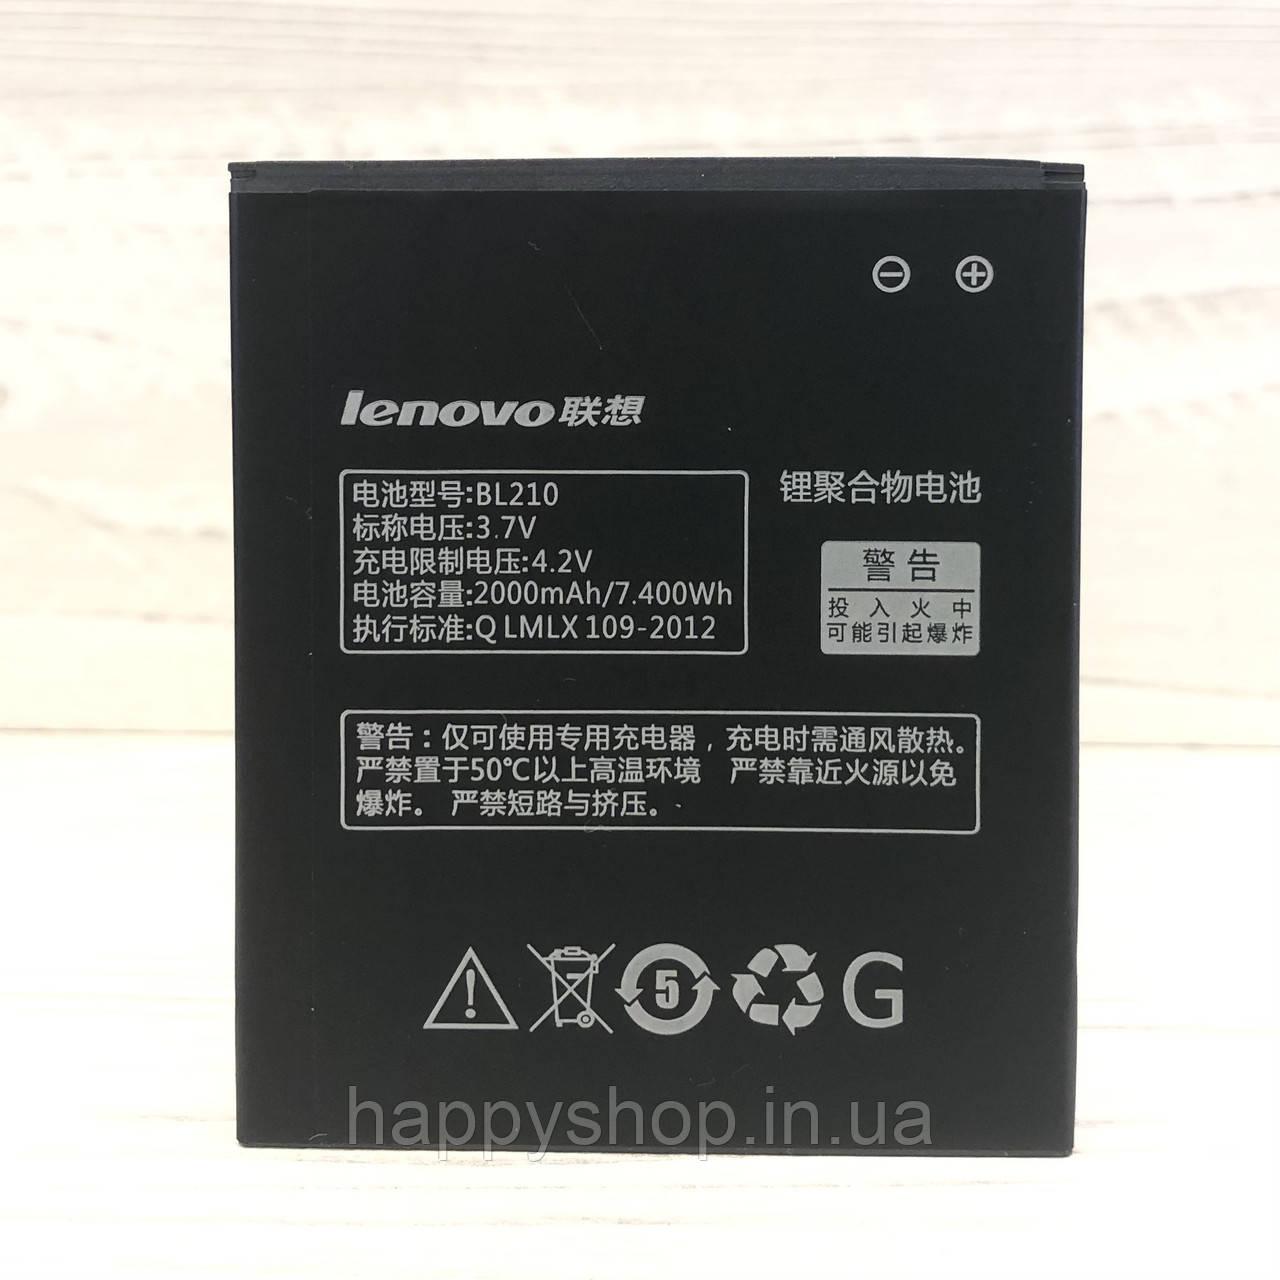 Оригінальна батарея Lenovo S820 (BL210)